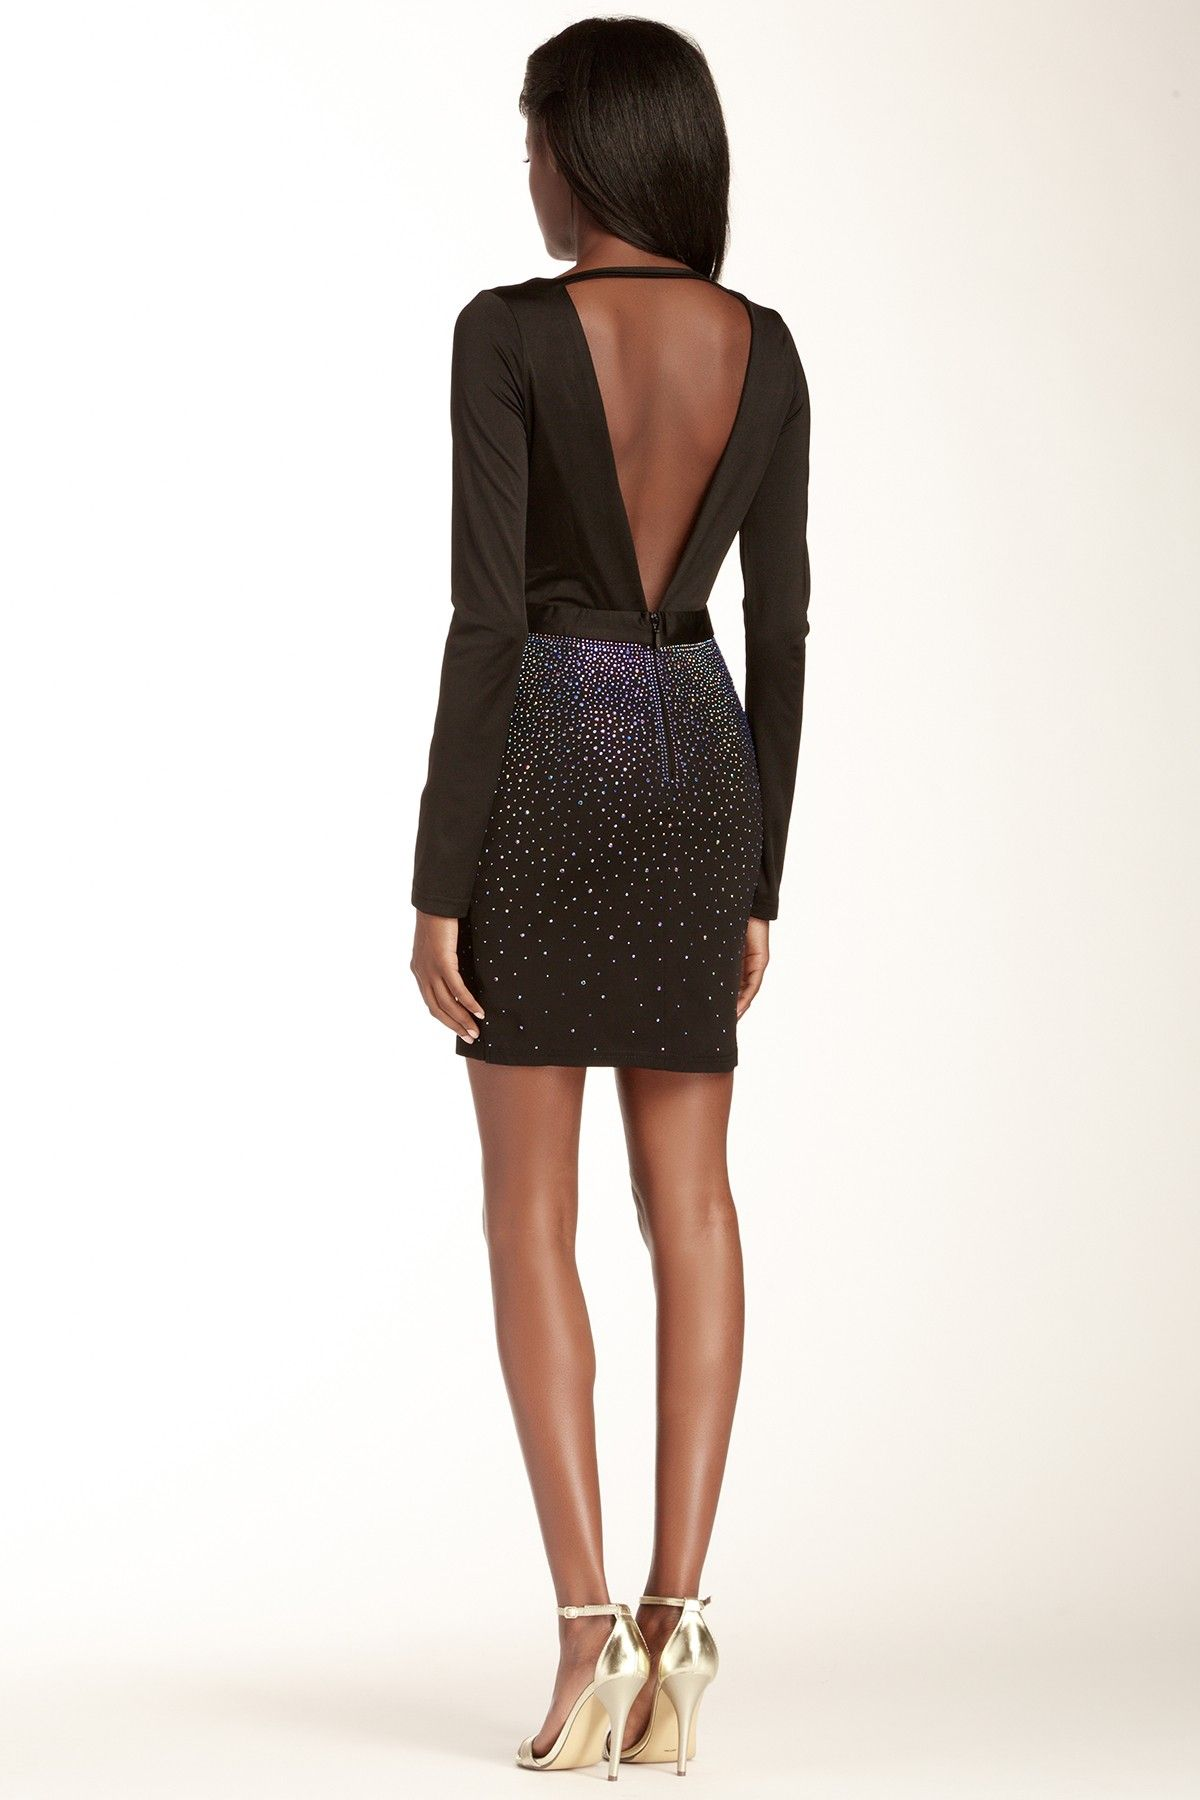 Rhinestone embellished long sleeve dress sleeved dress couture